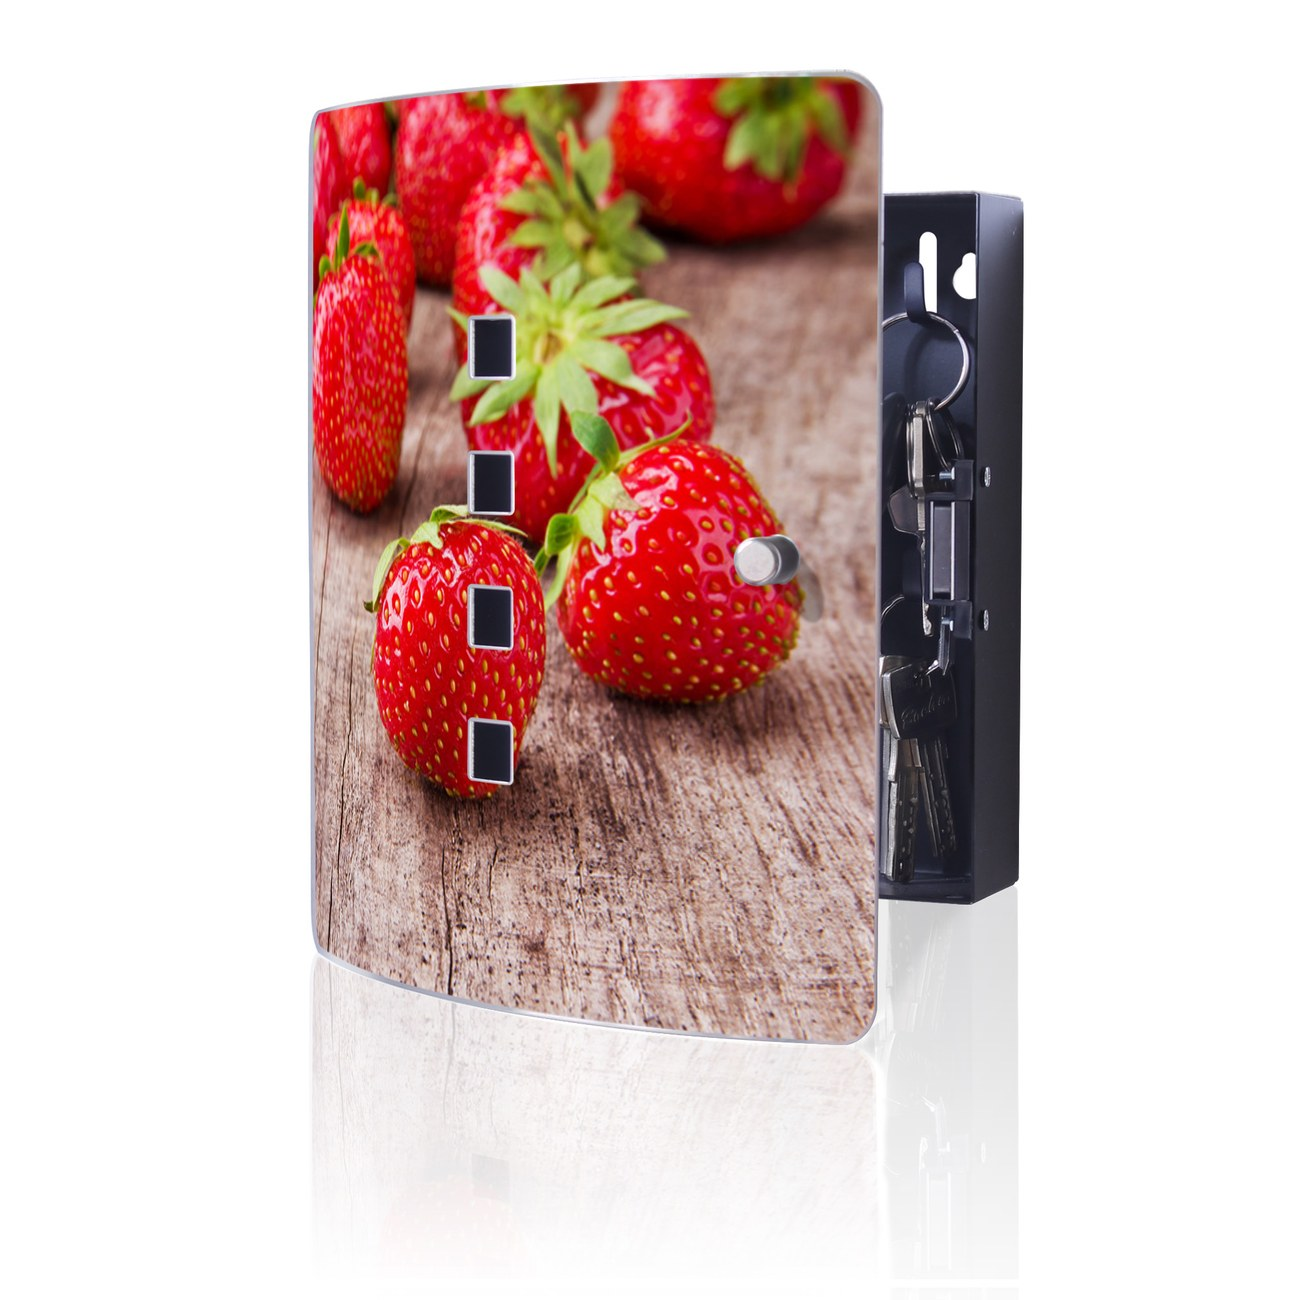 Schlüsselkasten Motiv Erdbeeren